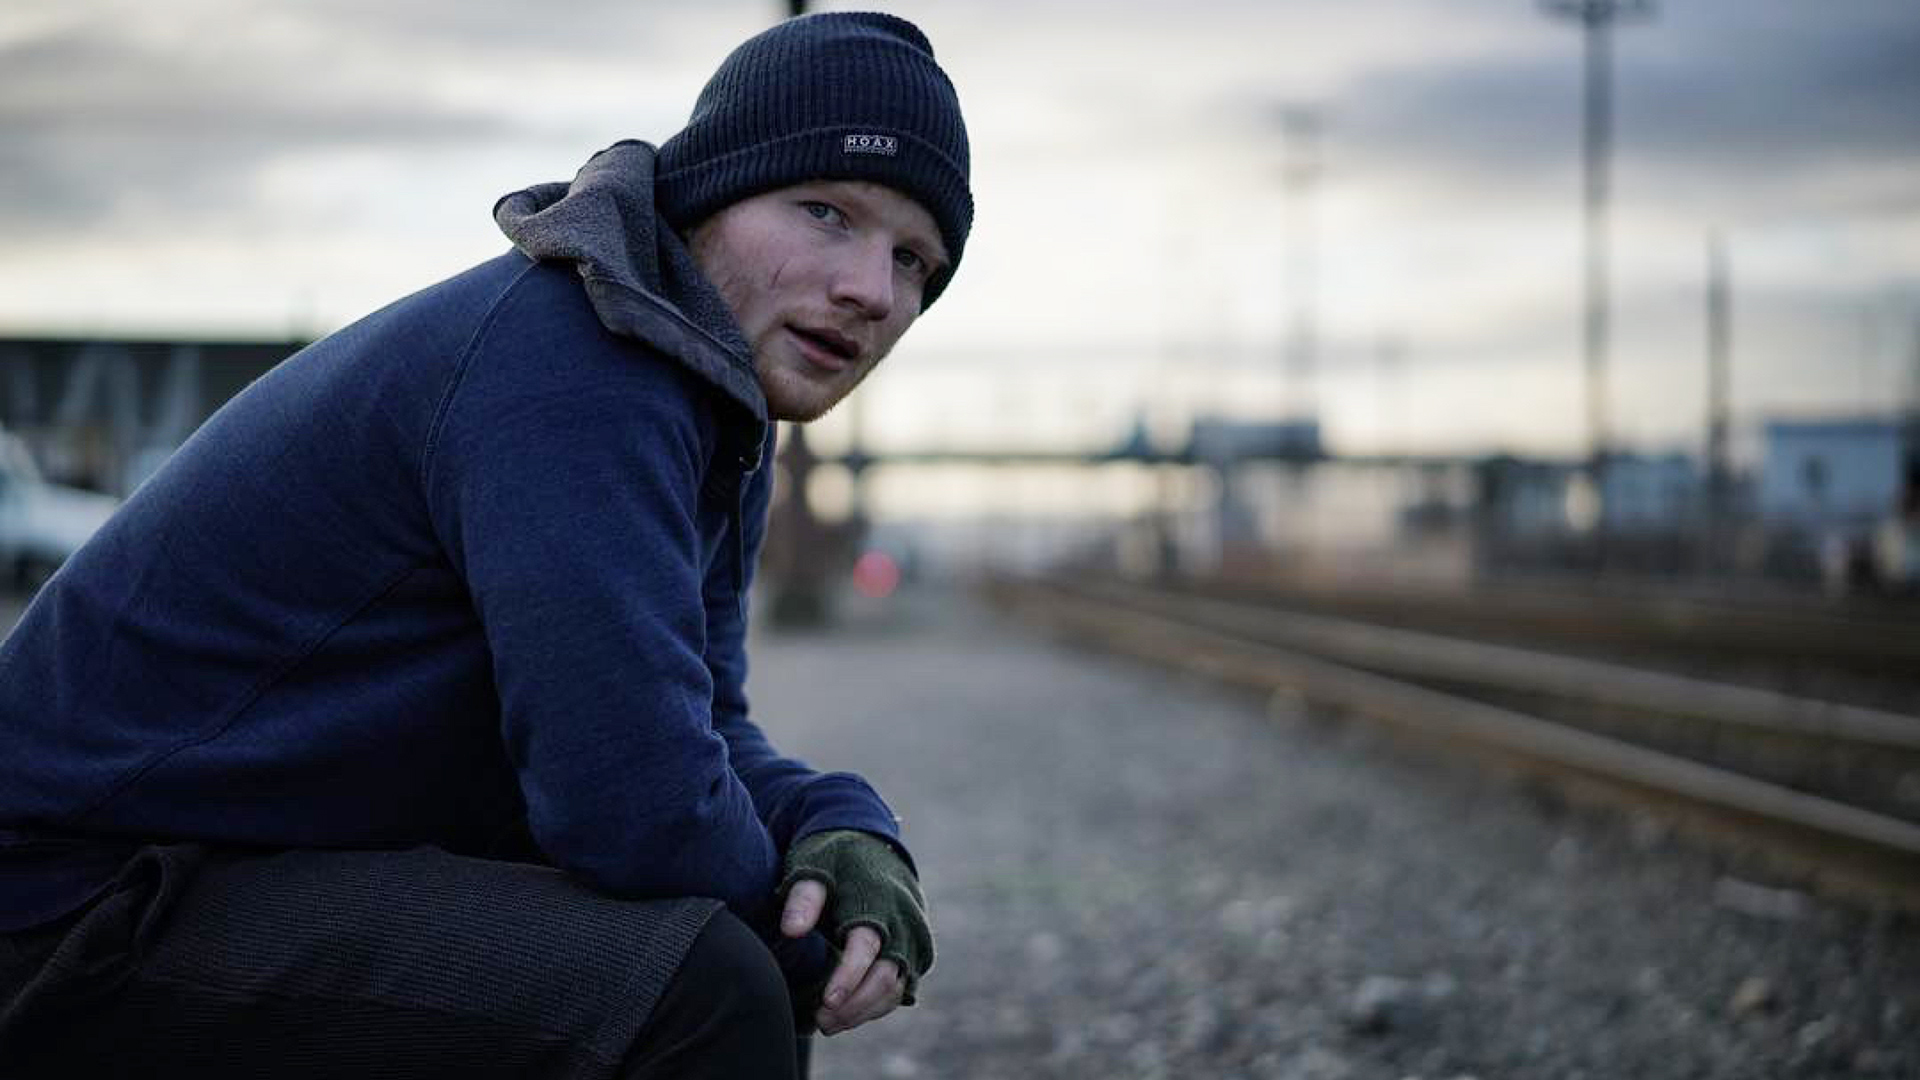 Hozier, Jesse & Joy, Ludovico Einaudi, Mashrou' Leila & more join Ed Sheeran for 'Give a Home' gigs